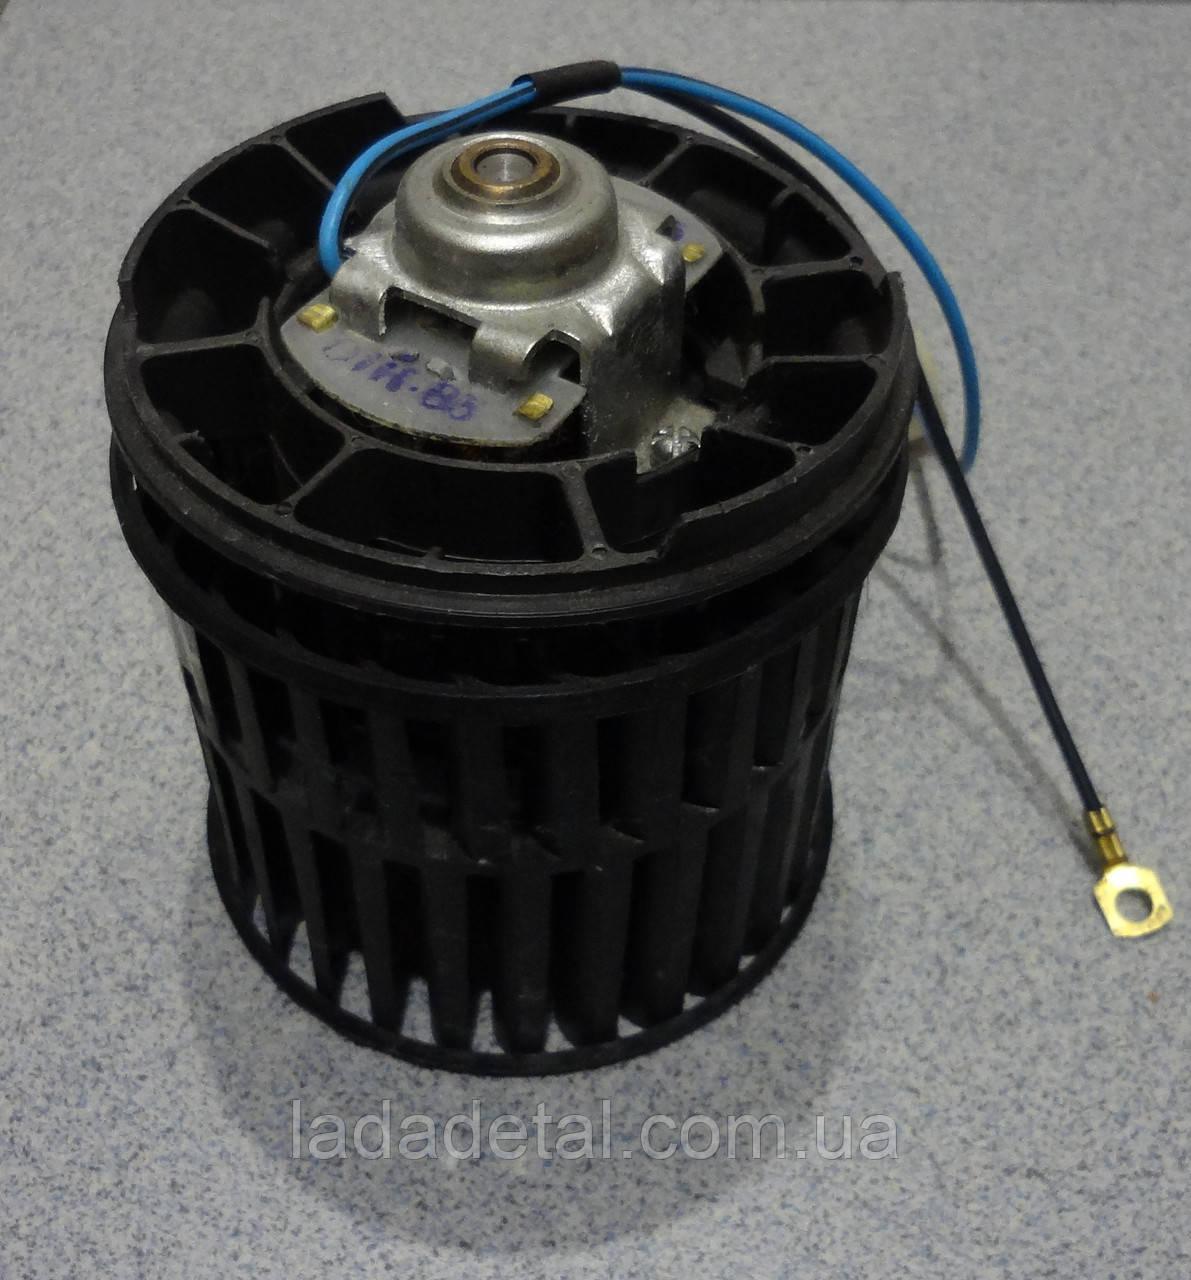 Мотор печки ВАЗ 2110, 2112, 2111 старый образец г.Калуга